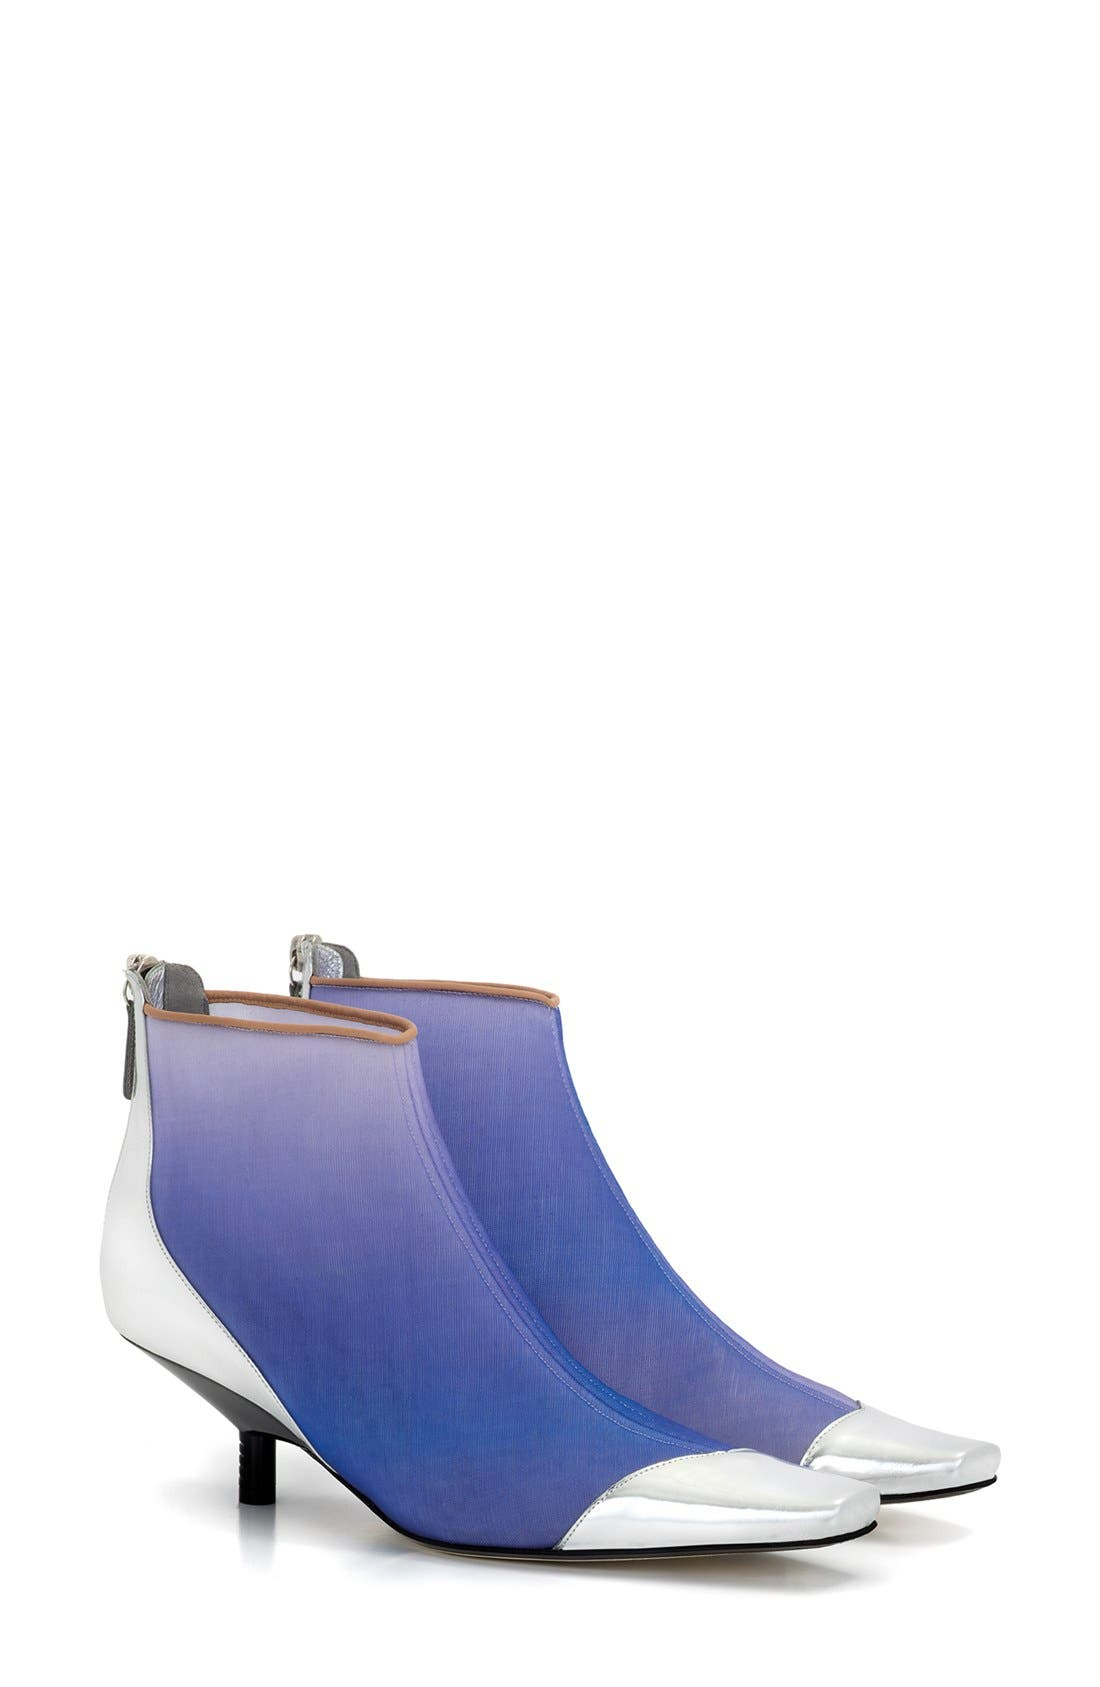 Main Image - Loewe Chelsea Boot (Women)